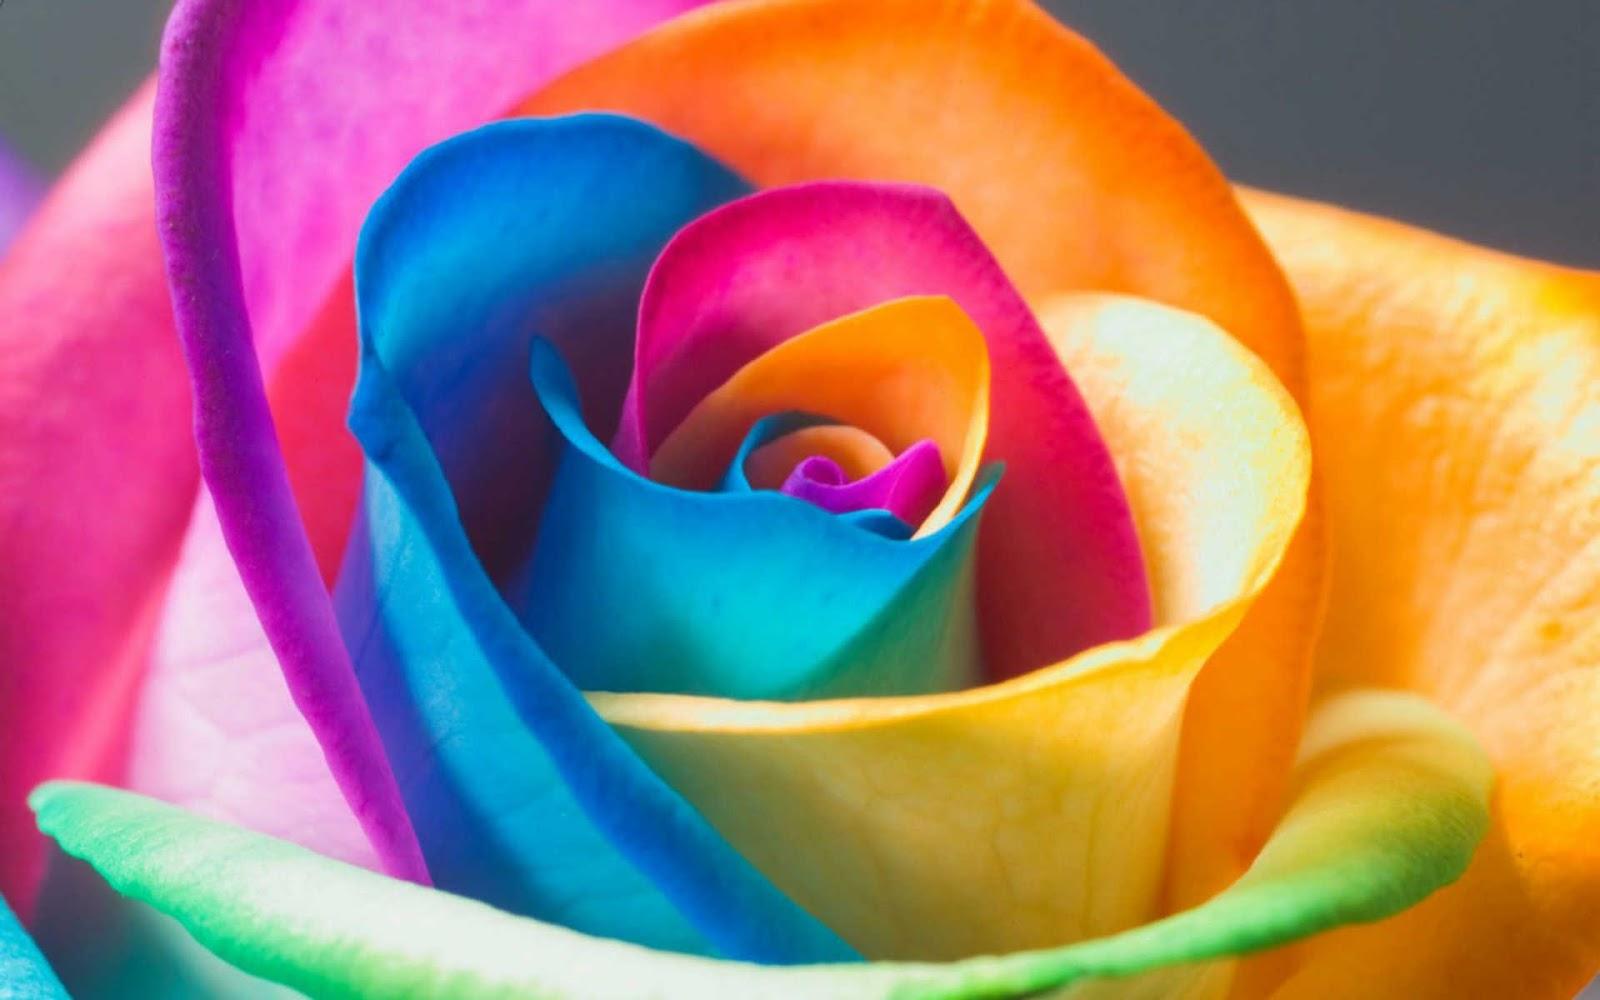 Gousicteco Neon Rainbow Roses Wallpaper Images